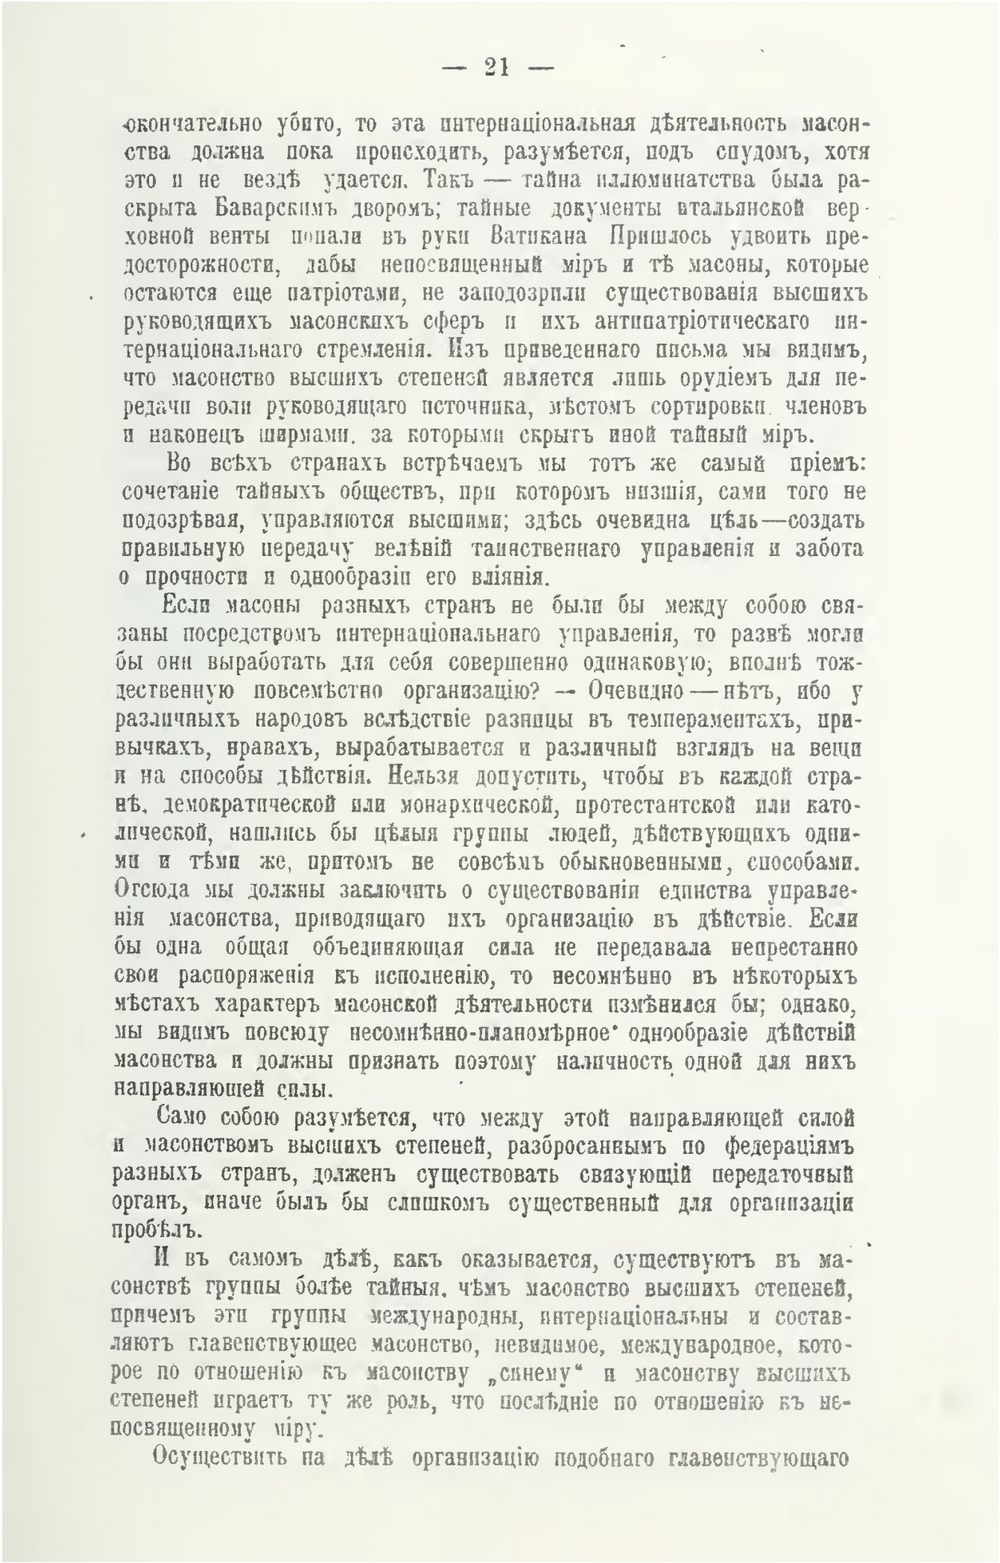 http://i2.imageban.ru/out/2014/01/14/1a6fd524171bbc6f10488b1b923a8af4.jpg